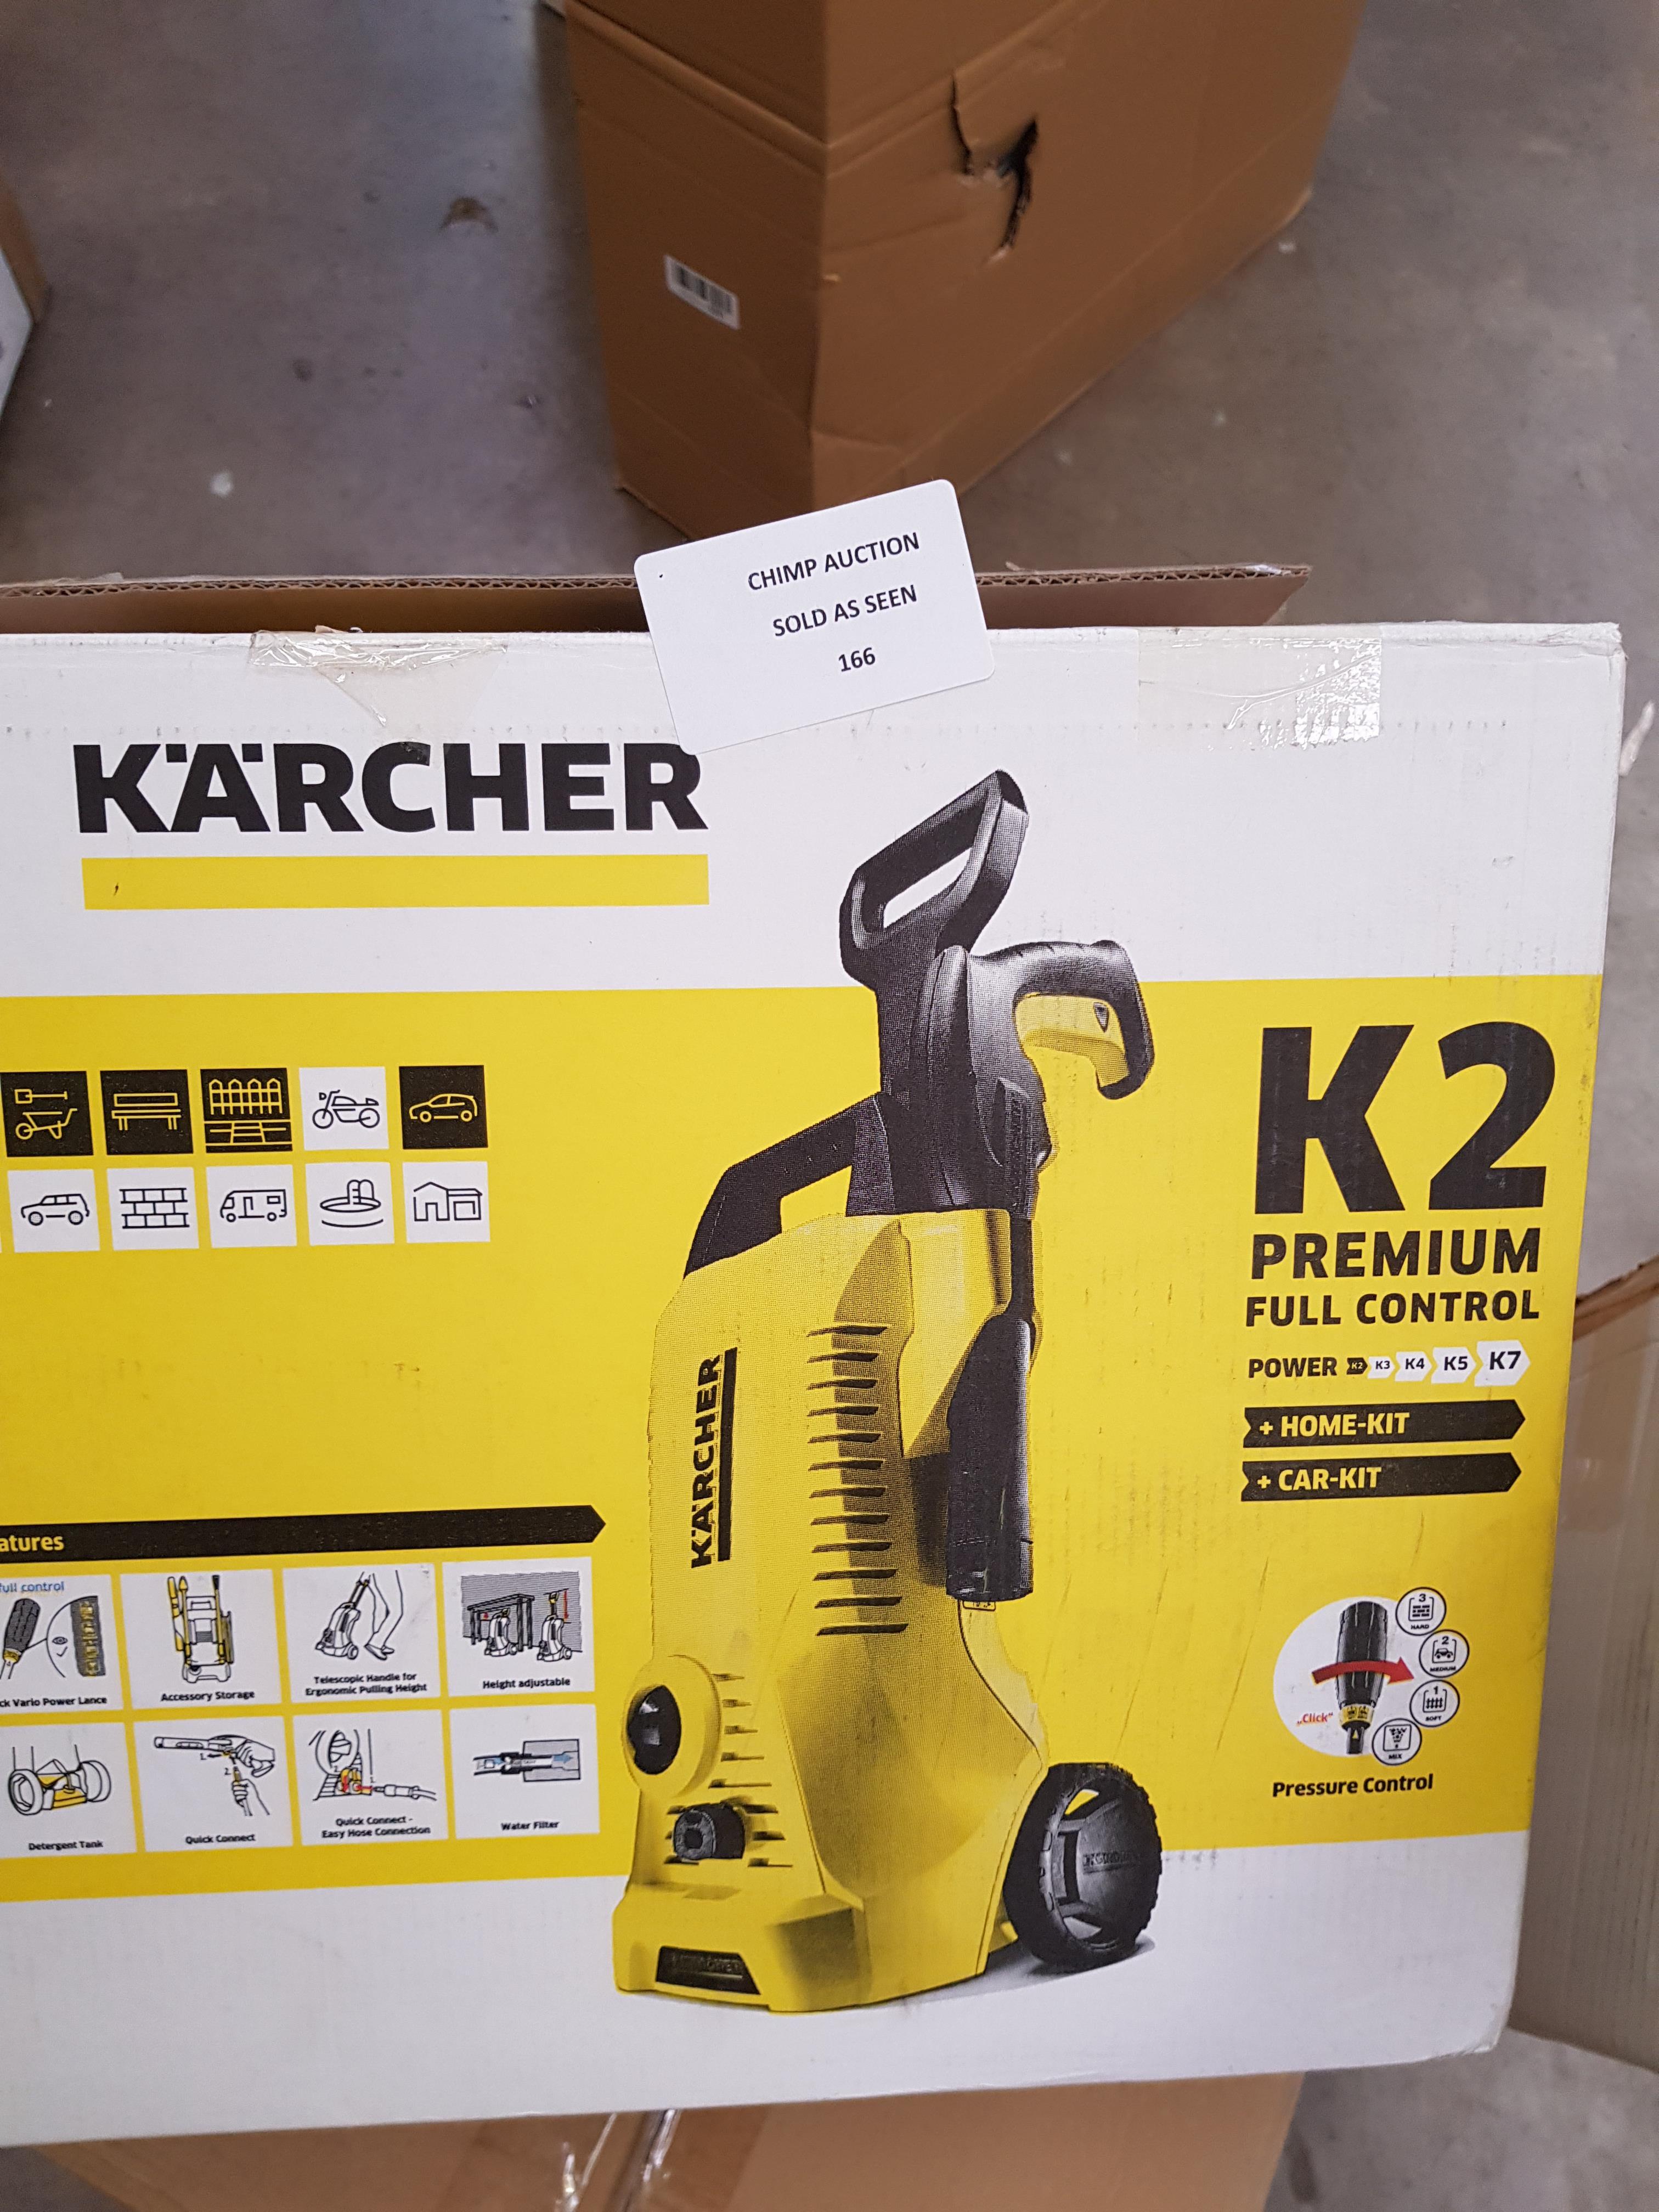 Lot 166 - Kärcher K2 Premium Full Control Home Pressure Washer RRP £169.99